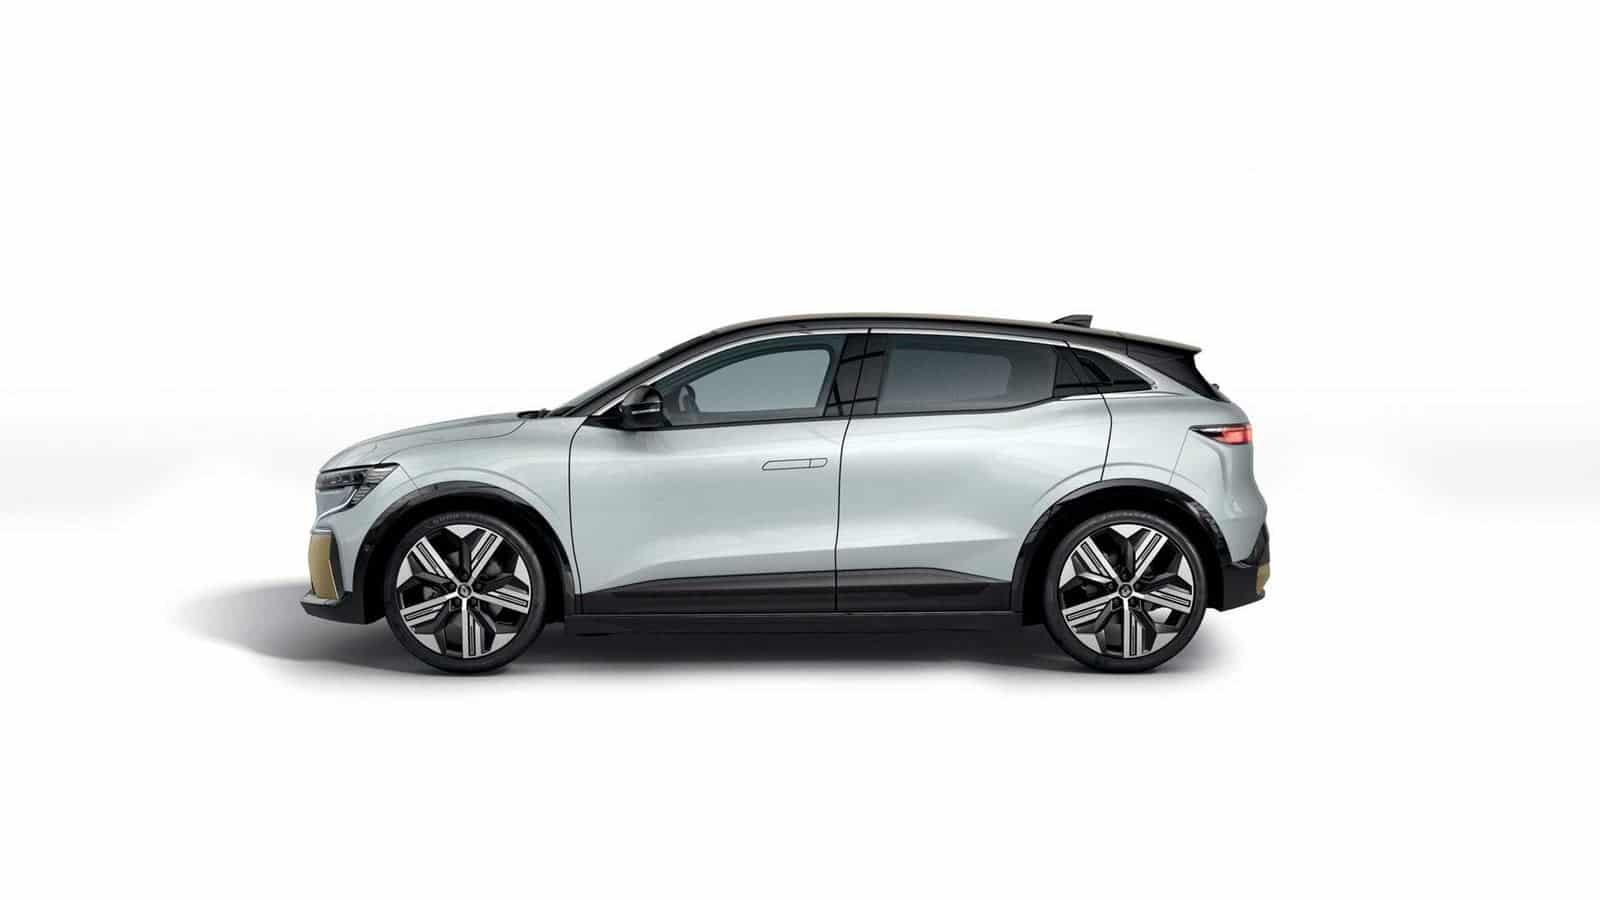 Renault Mégane E-TECH lateral